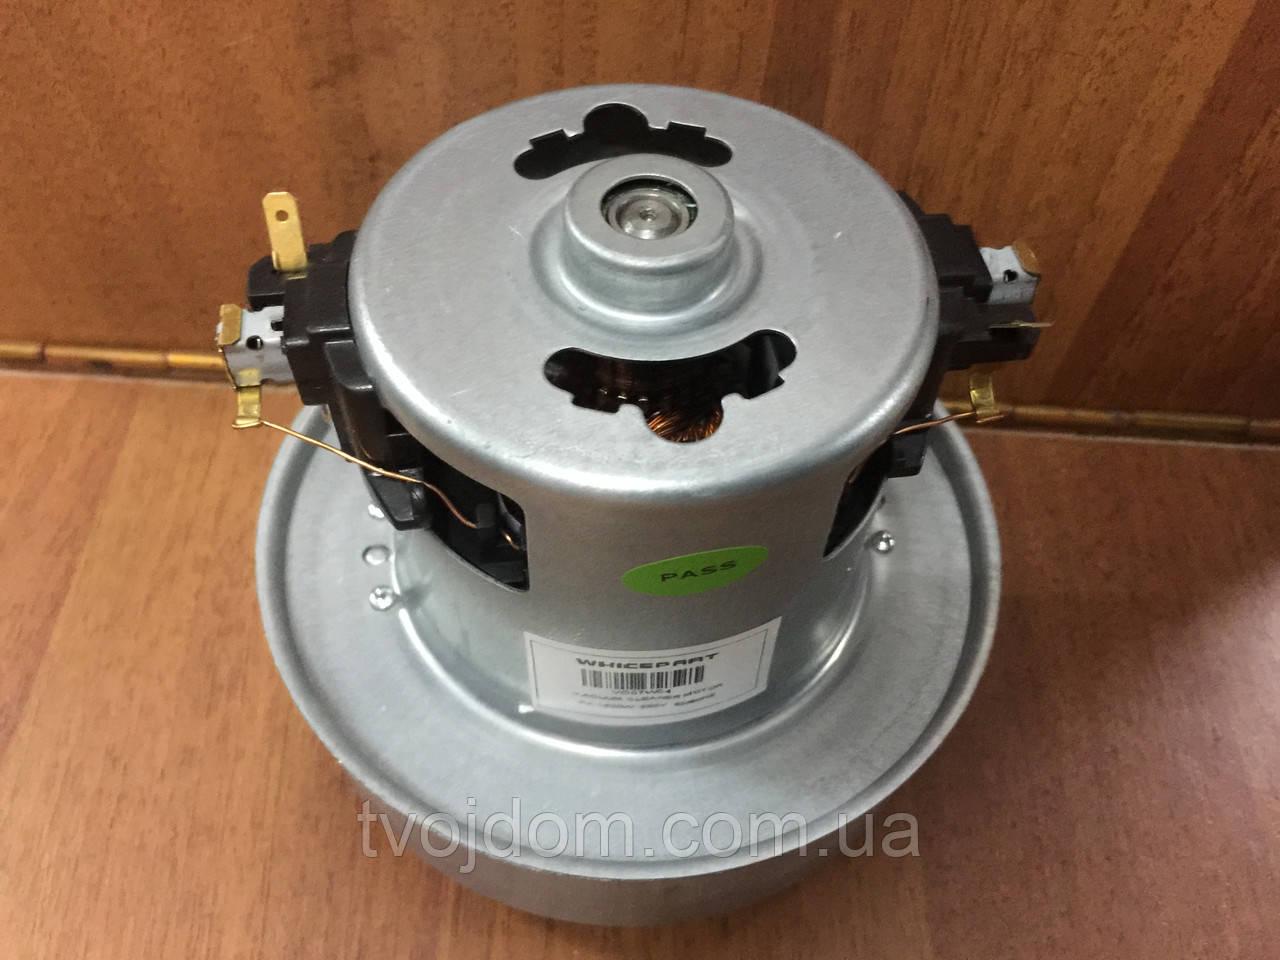 Двигатель для пылесоса PA1600W(VC07WO4)